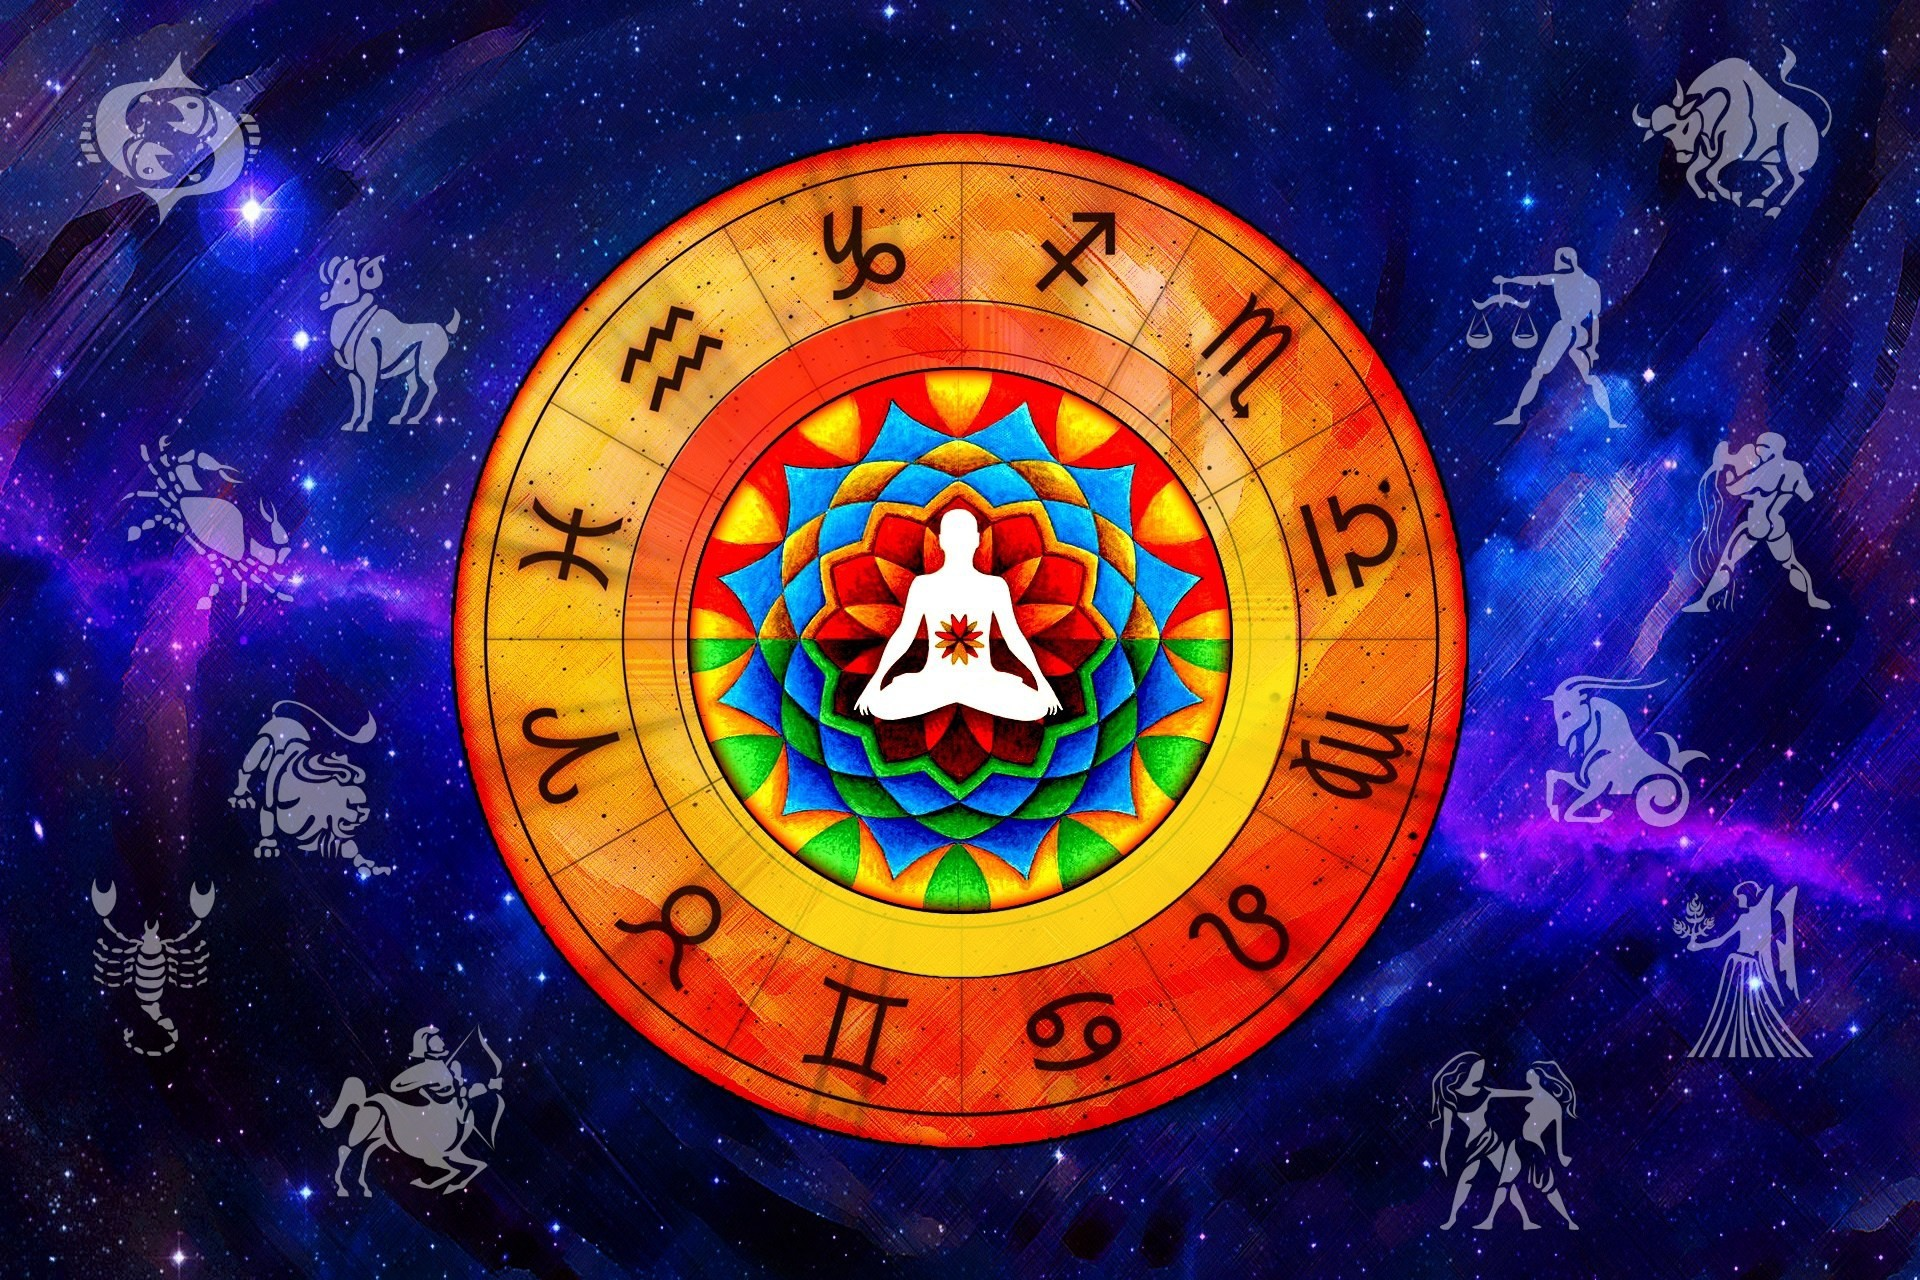 Centered zodiac